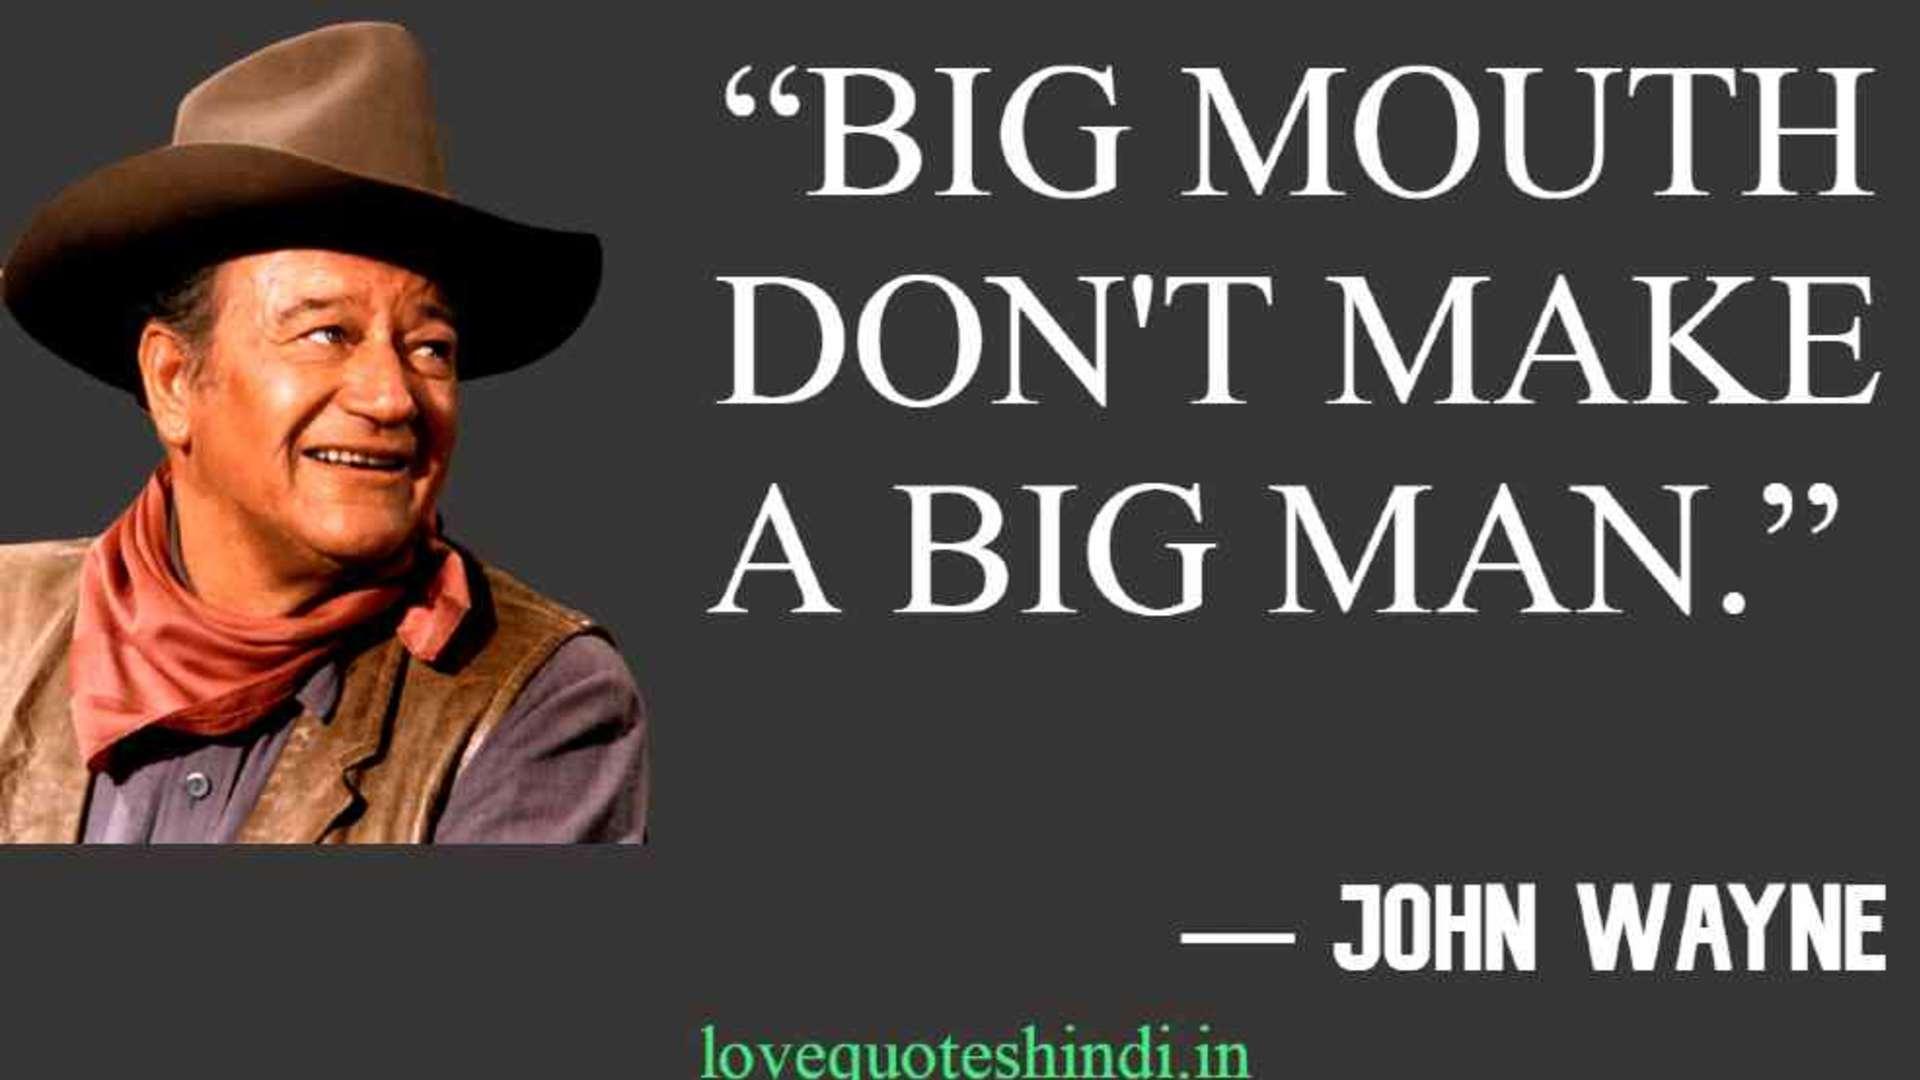 75 Famous Quotes of John Wayne From Movies. Best John Wayne Quotes